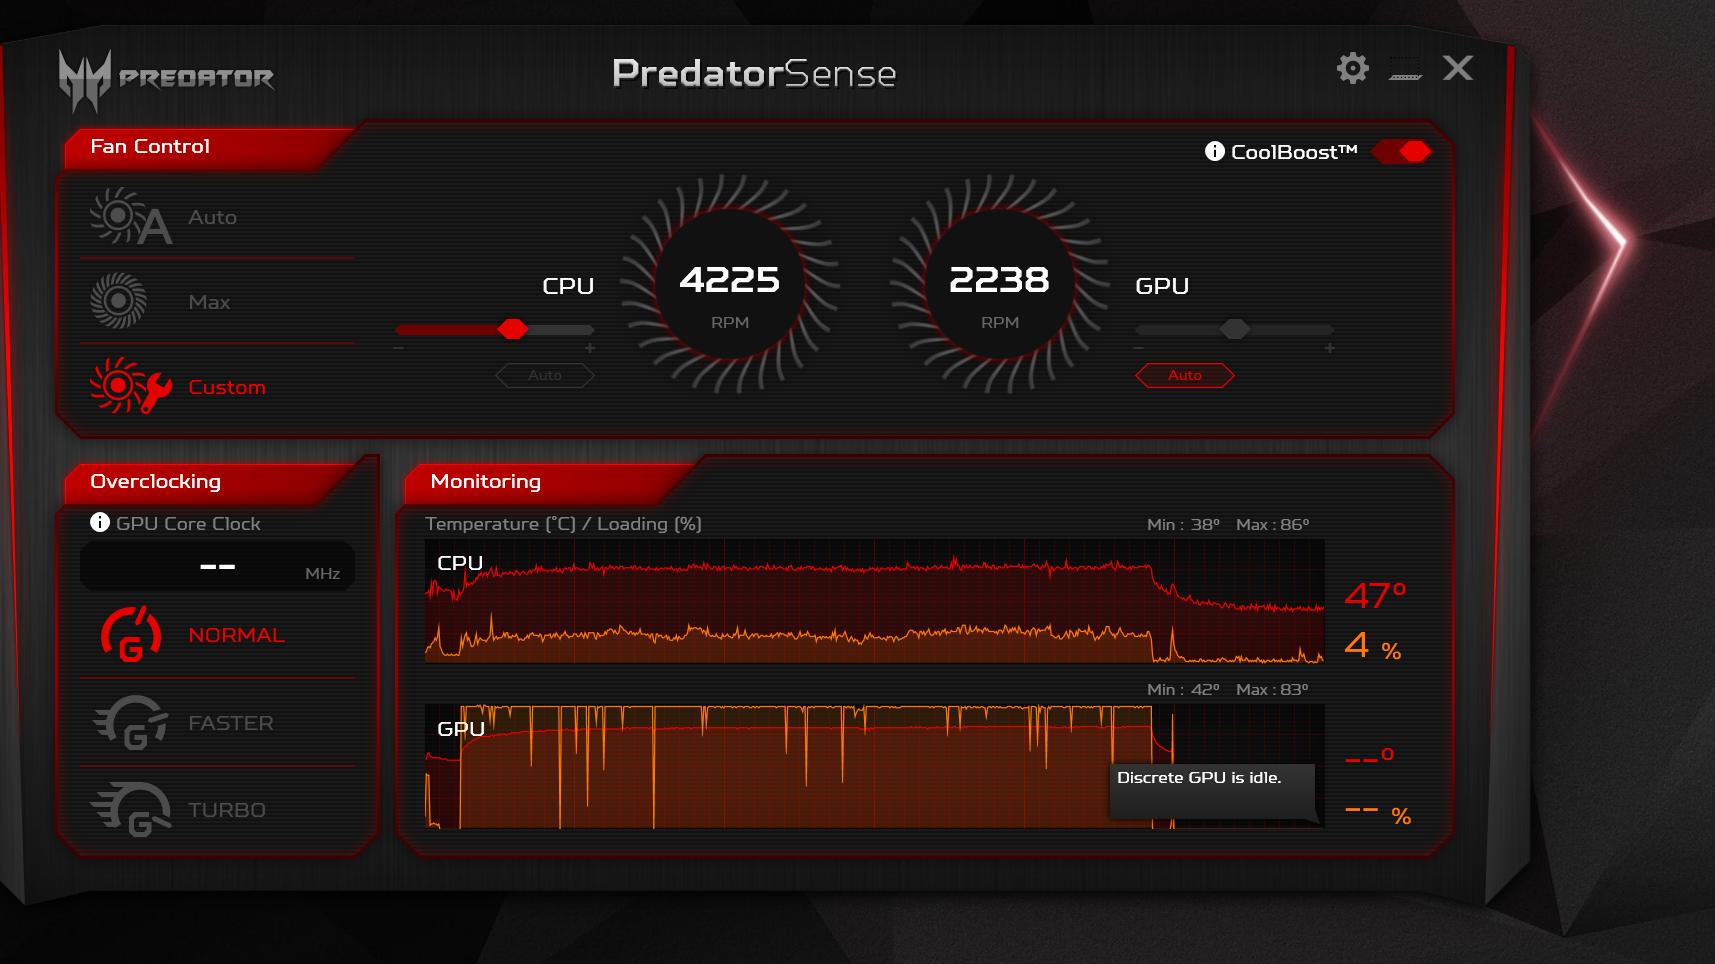 Predator Sense GPU Loading Graph reached 99% when playing